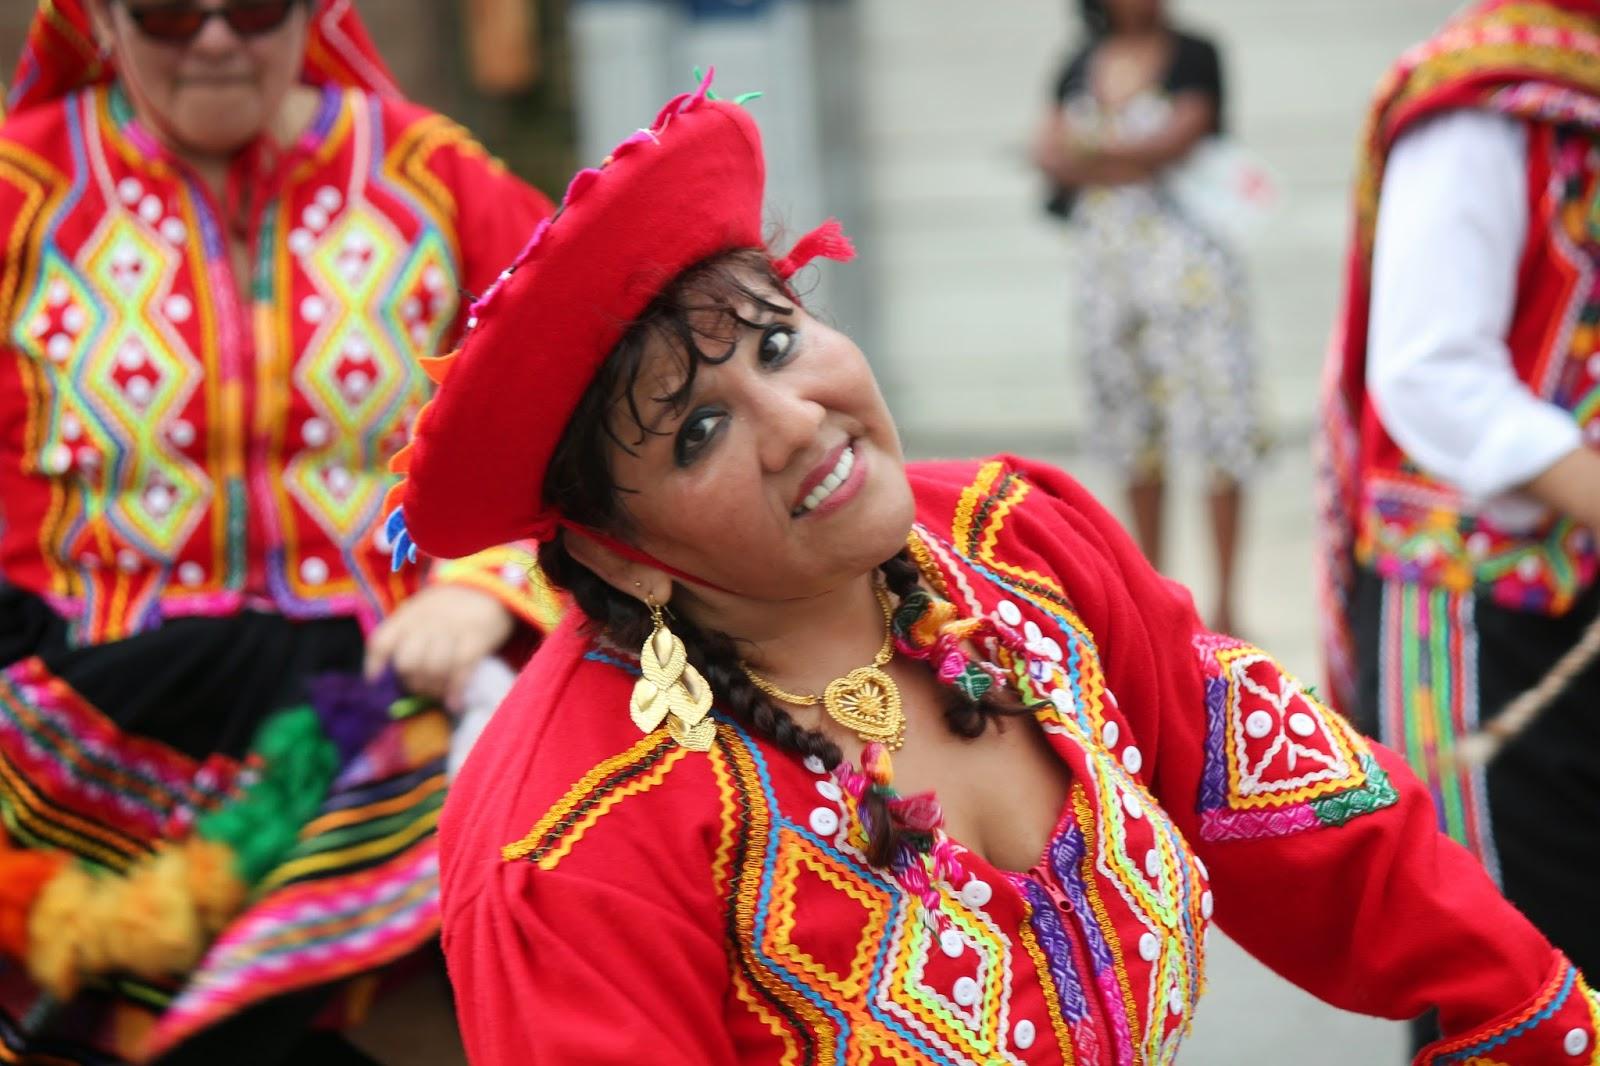 Parada peruana de Paterson New Jersey USA